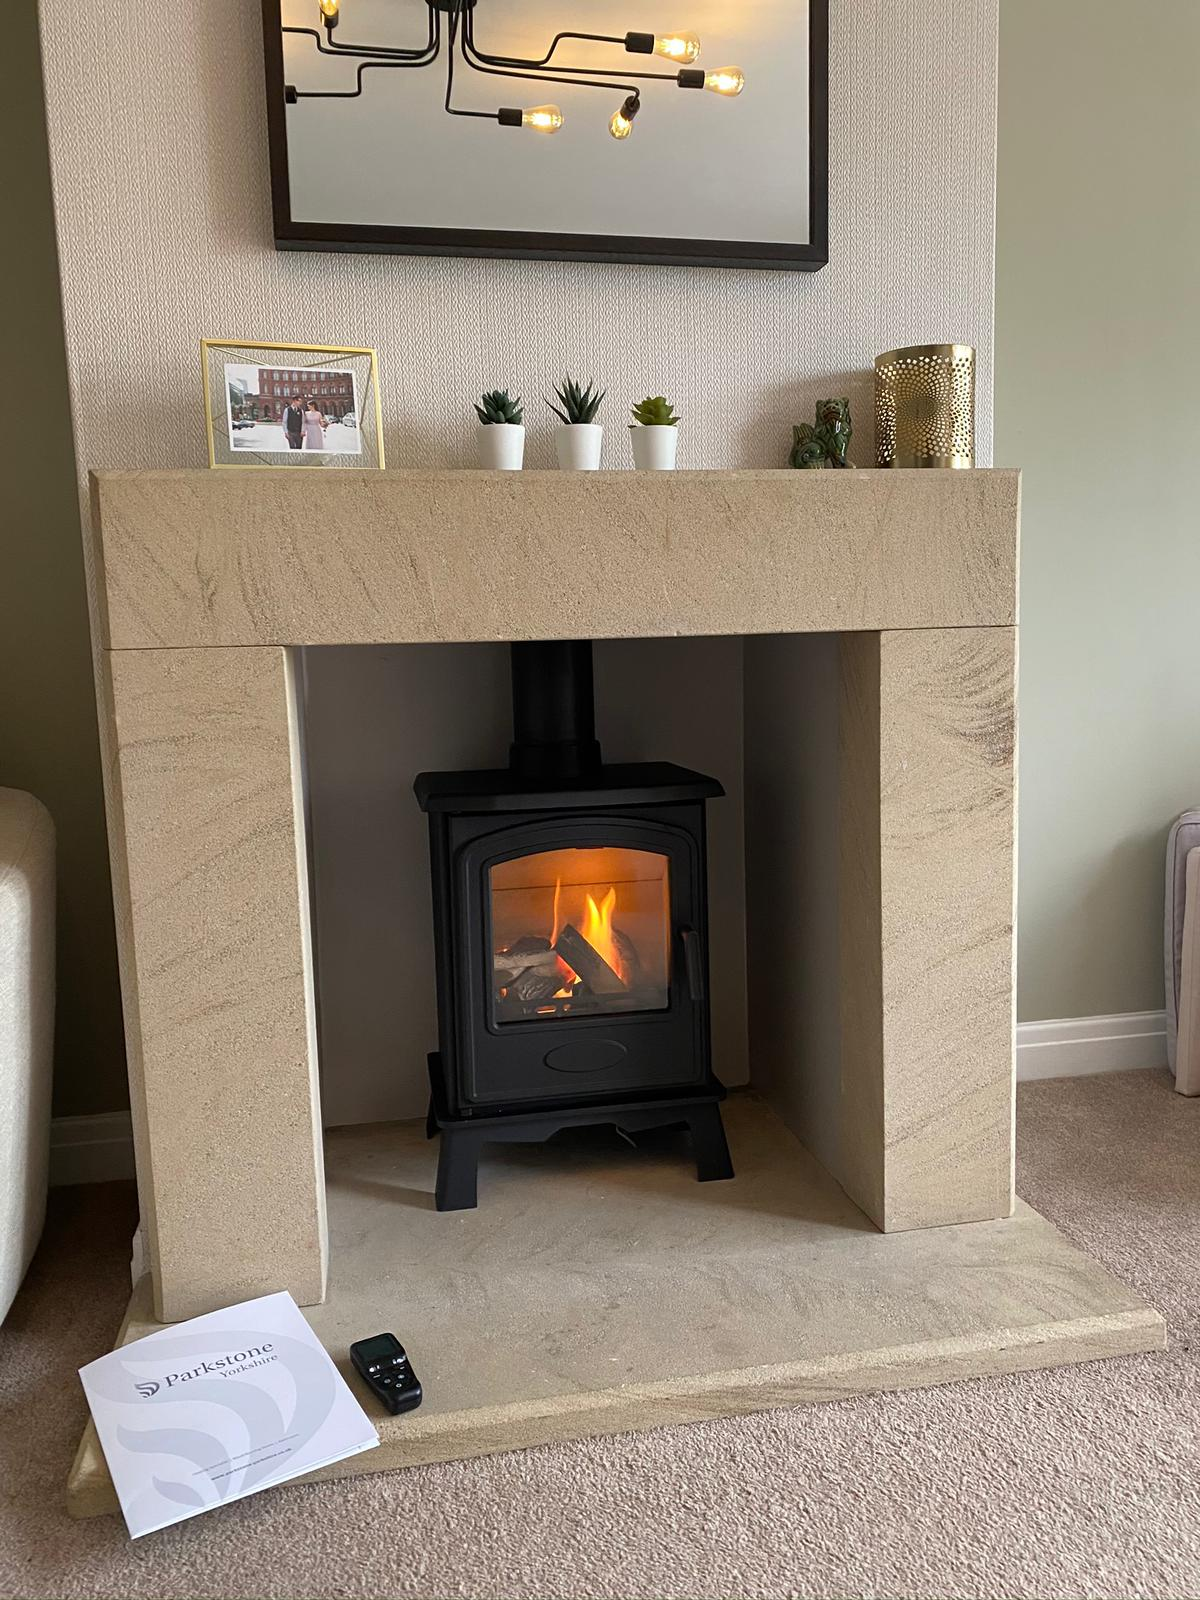 Brosley Hereford 5 stove installation